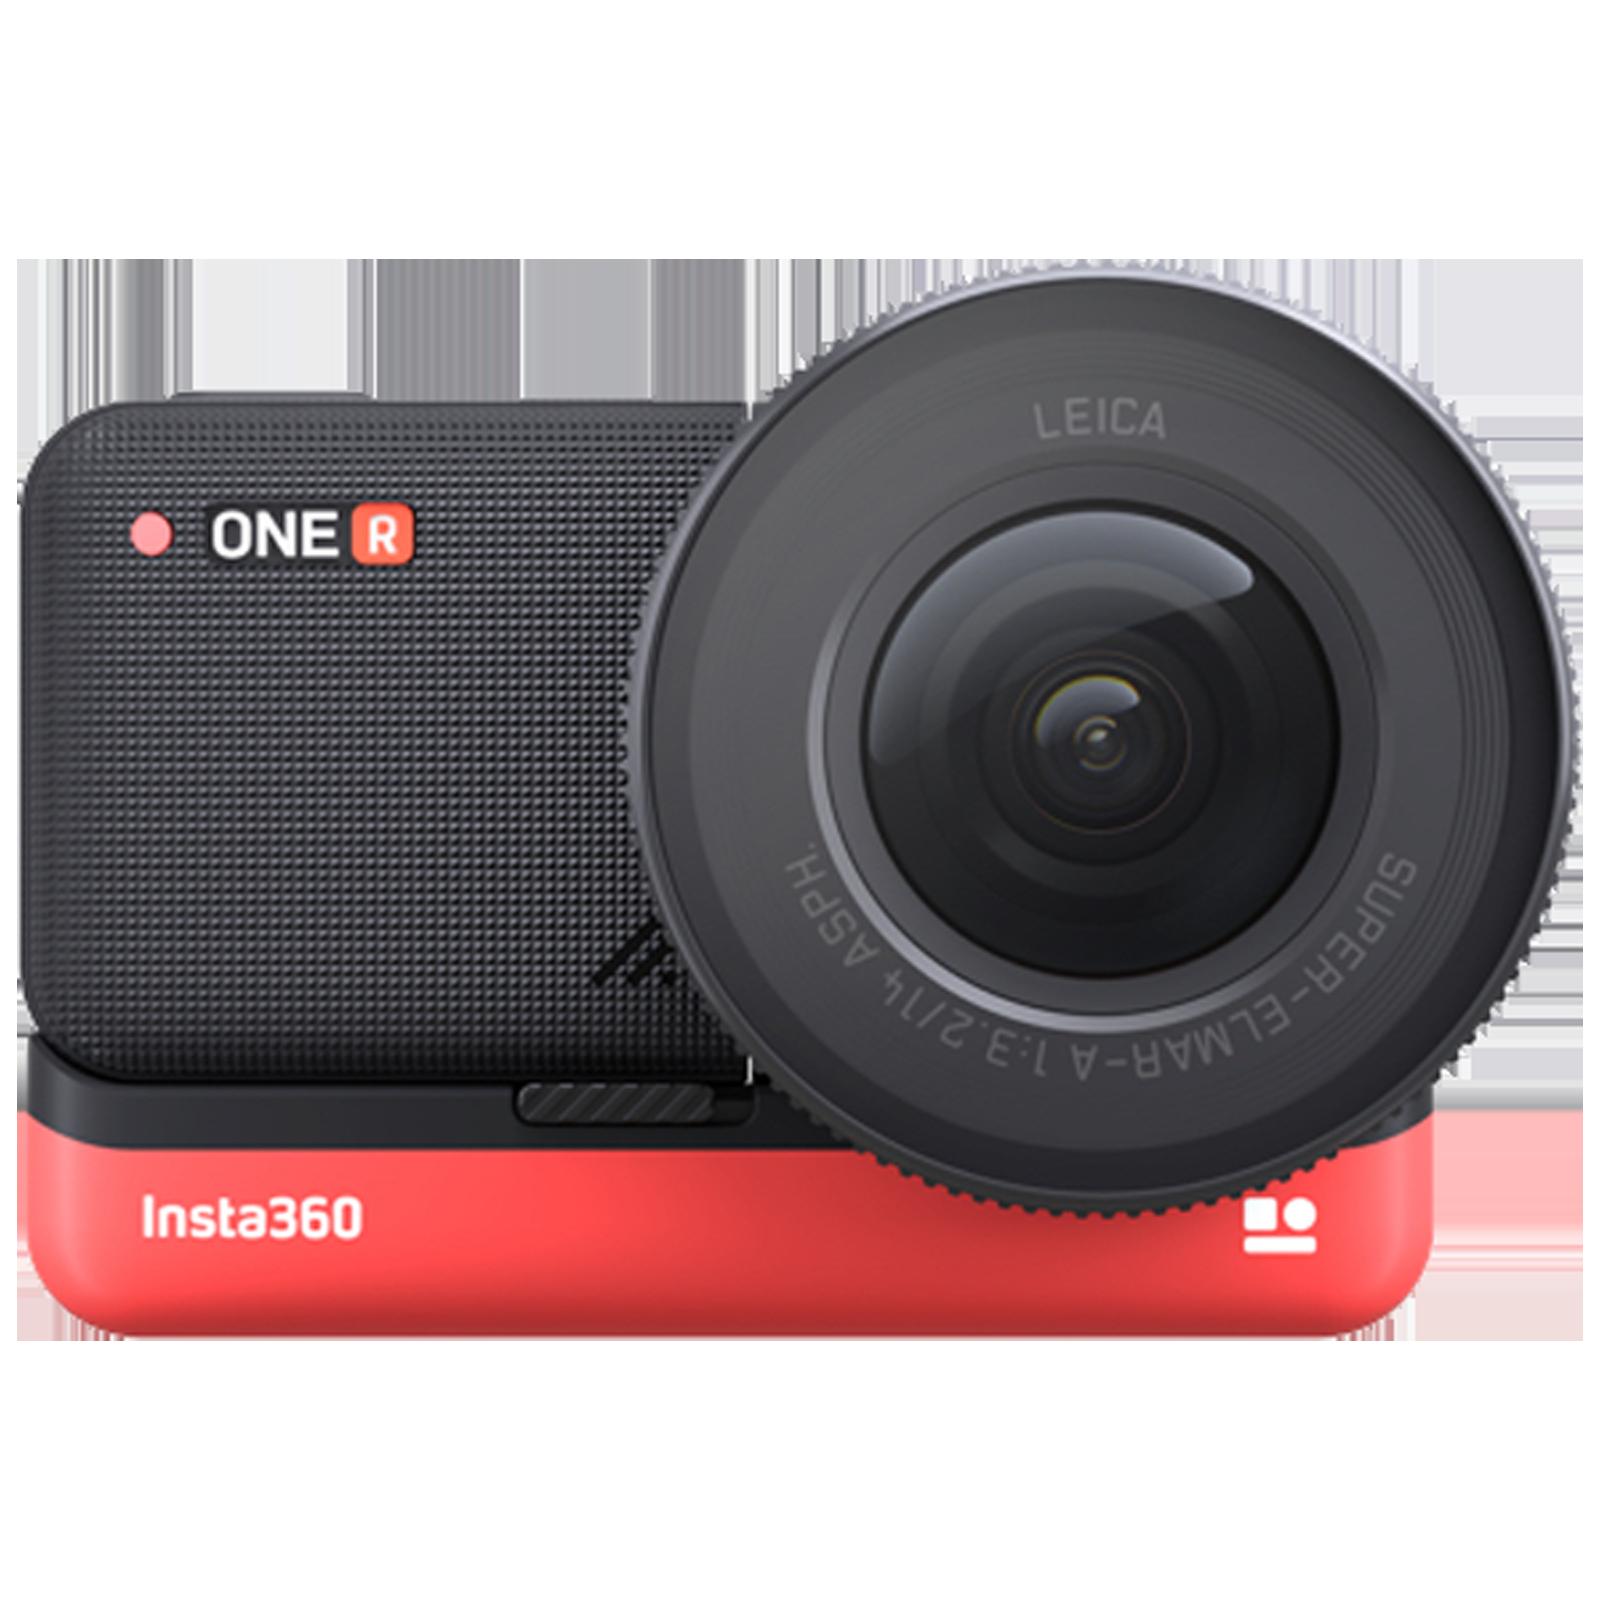 Insta360 One R Ultimate 12MP Action Camera (3x Optical Zoom, Scene-Detection Algorithm, IN.00000006.01, Black)_1